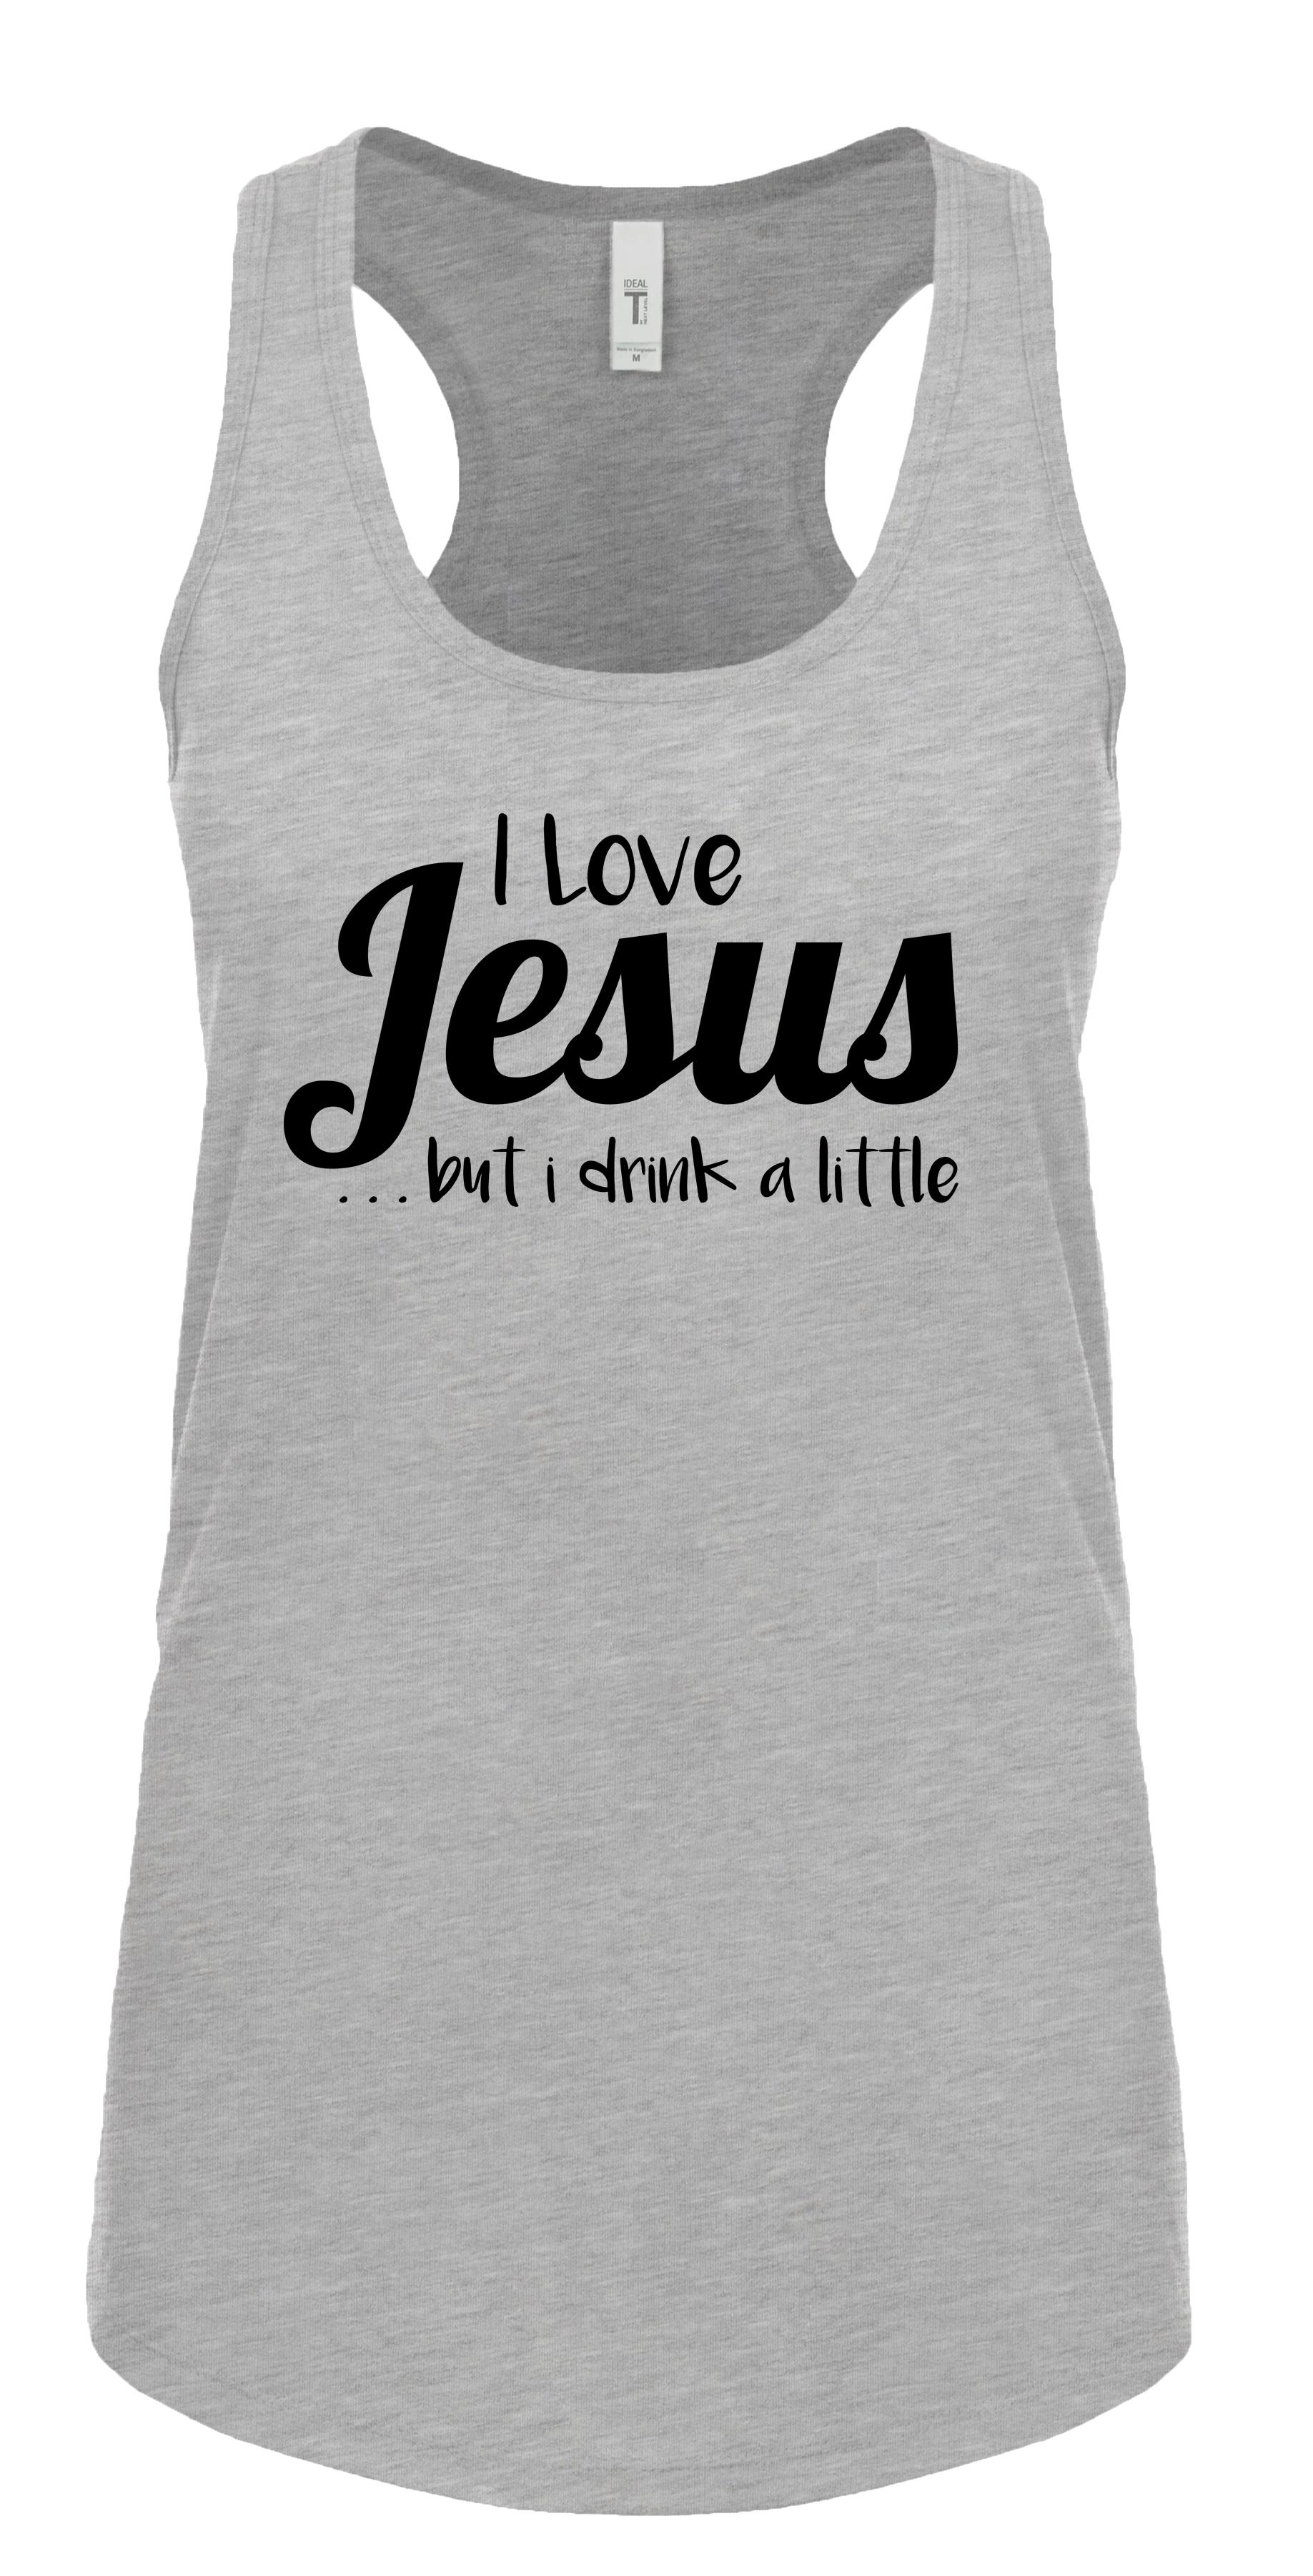 I Love Jesus But I Cuss a Little Tank Top Womens Tri-Blend Racerback Tank.